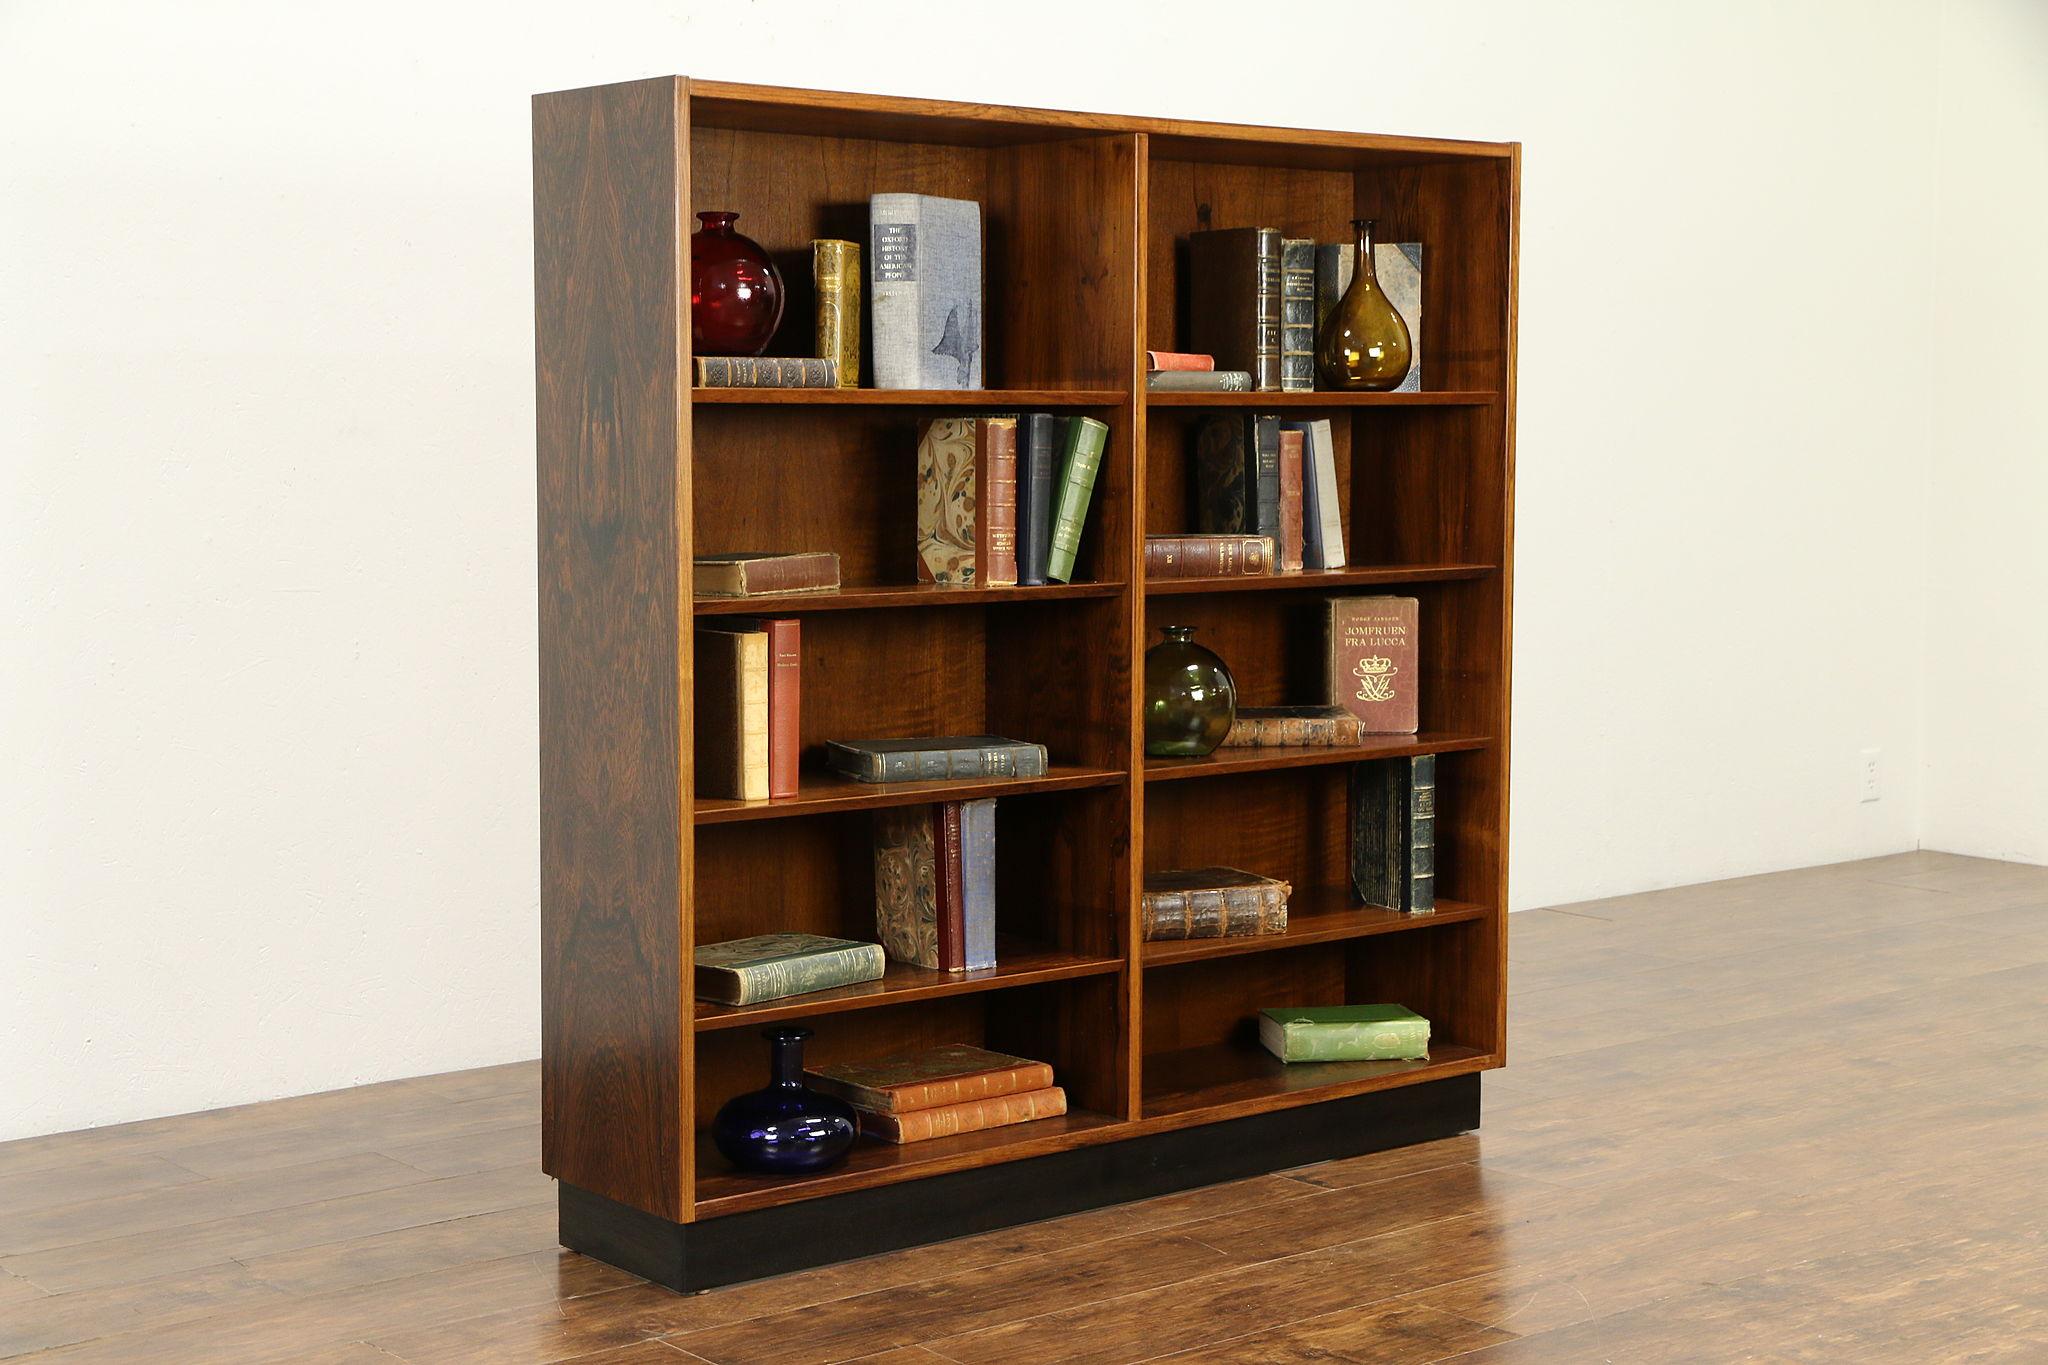 Image of: Sold Midcentury Modern Danish Rosewood Vintage Bookcase Hu Hundevad 33066 Harp Gallery Antiques Furniture